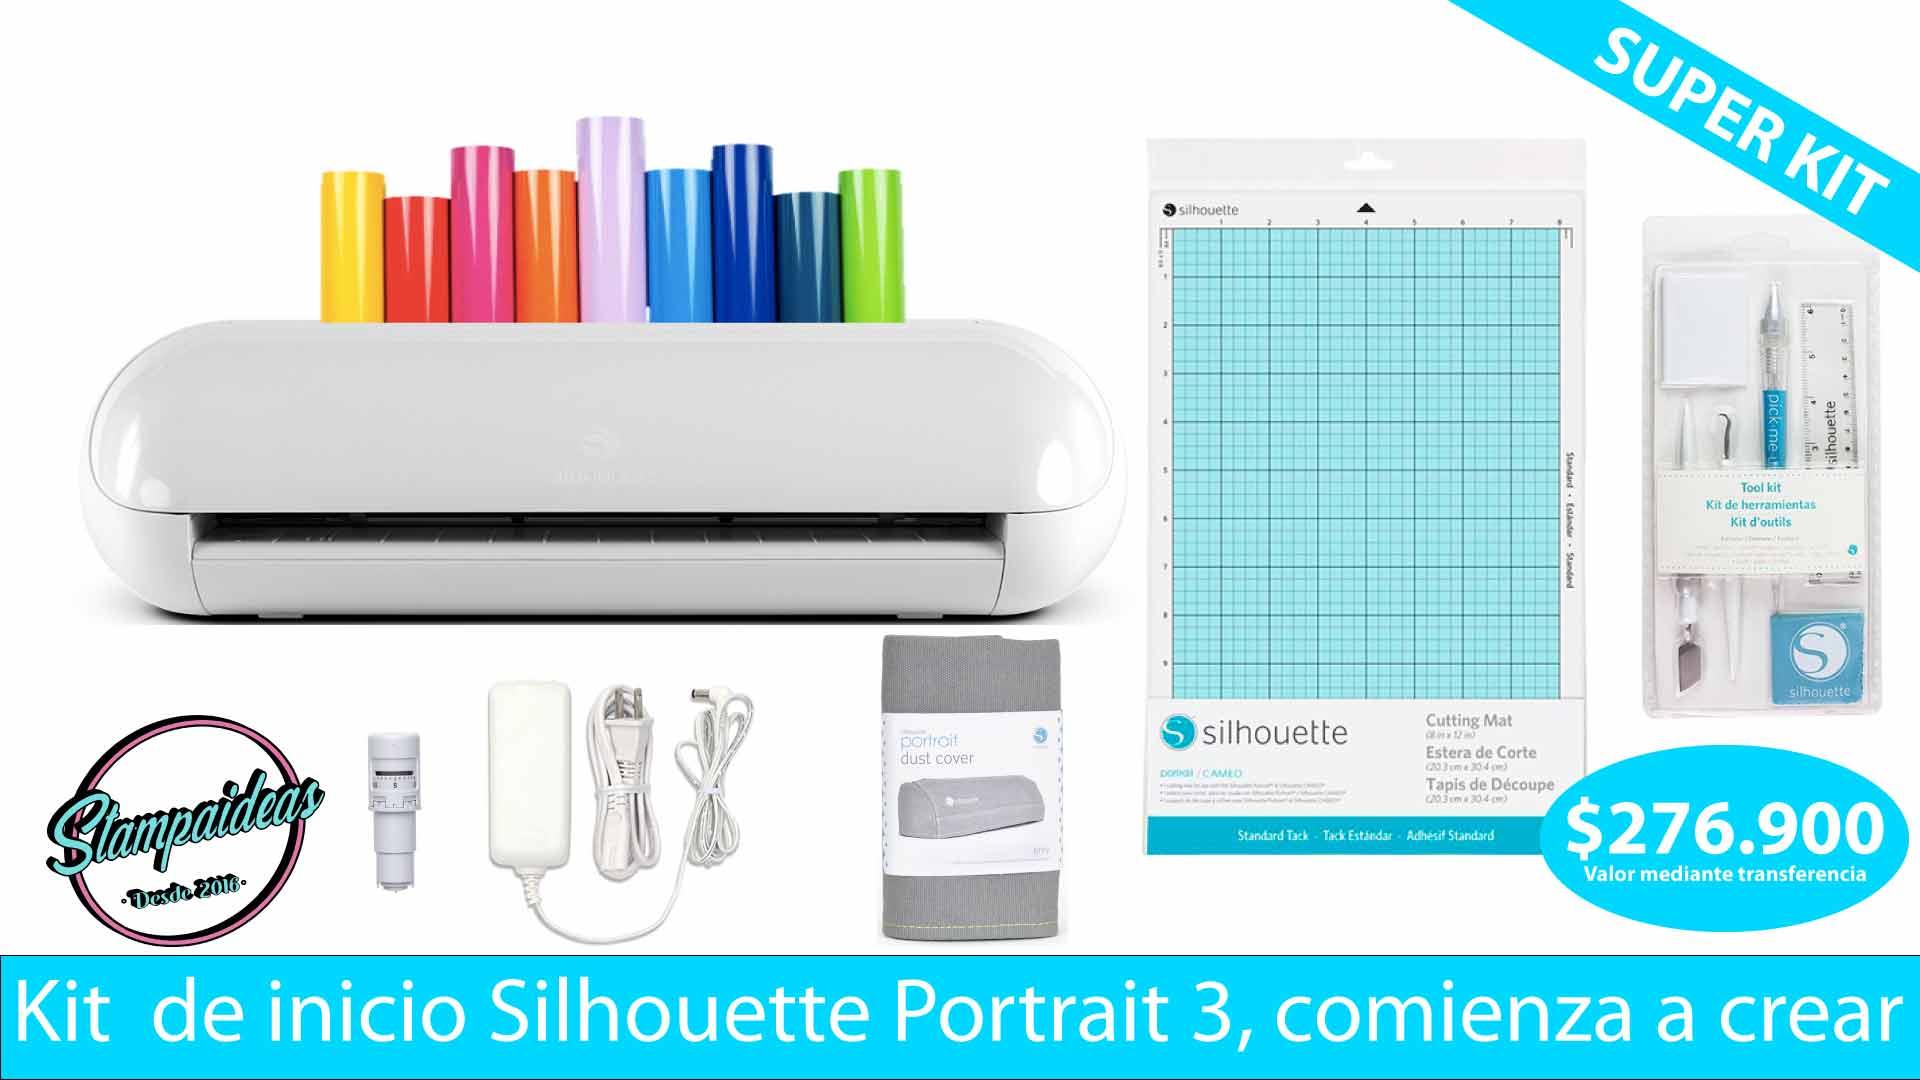 Silhouette portrait 3 kit de inicio